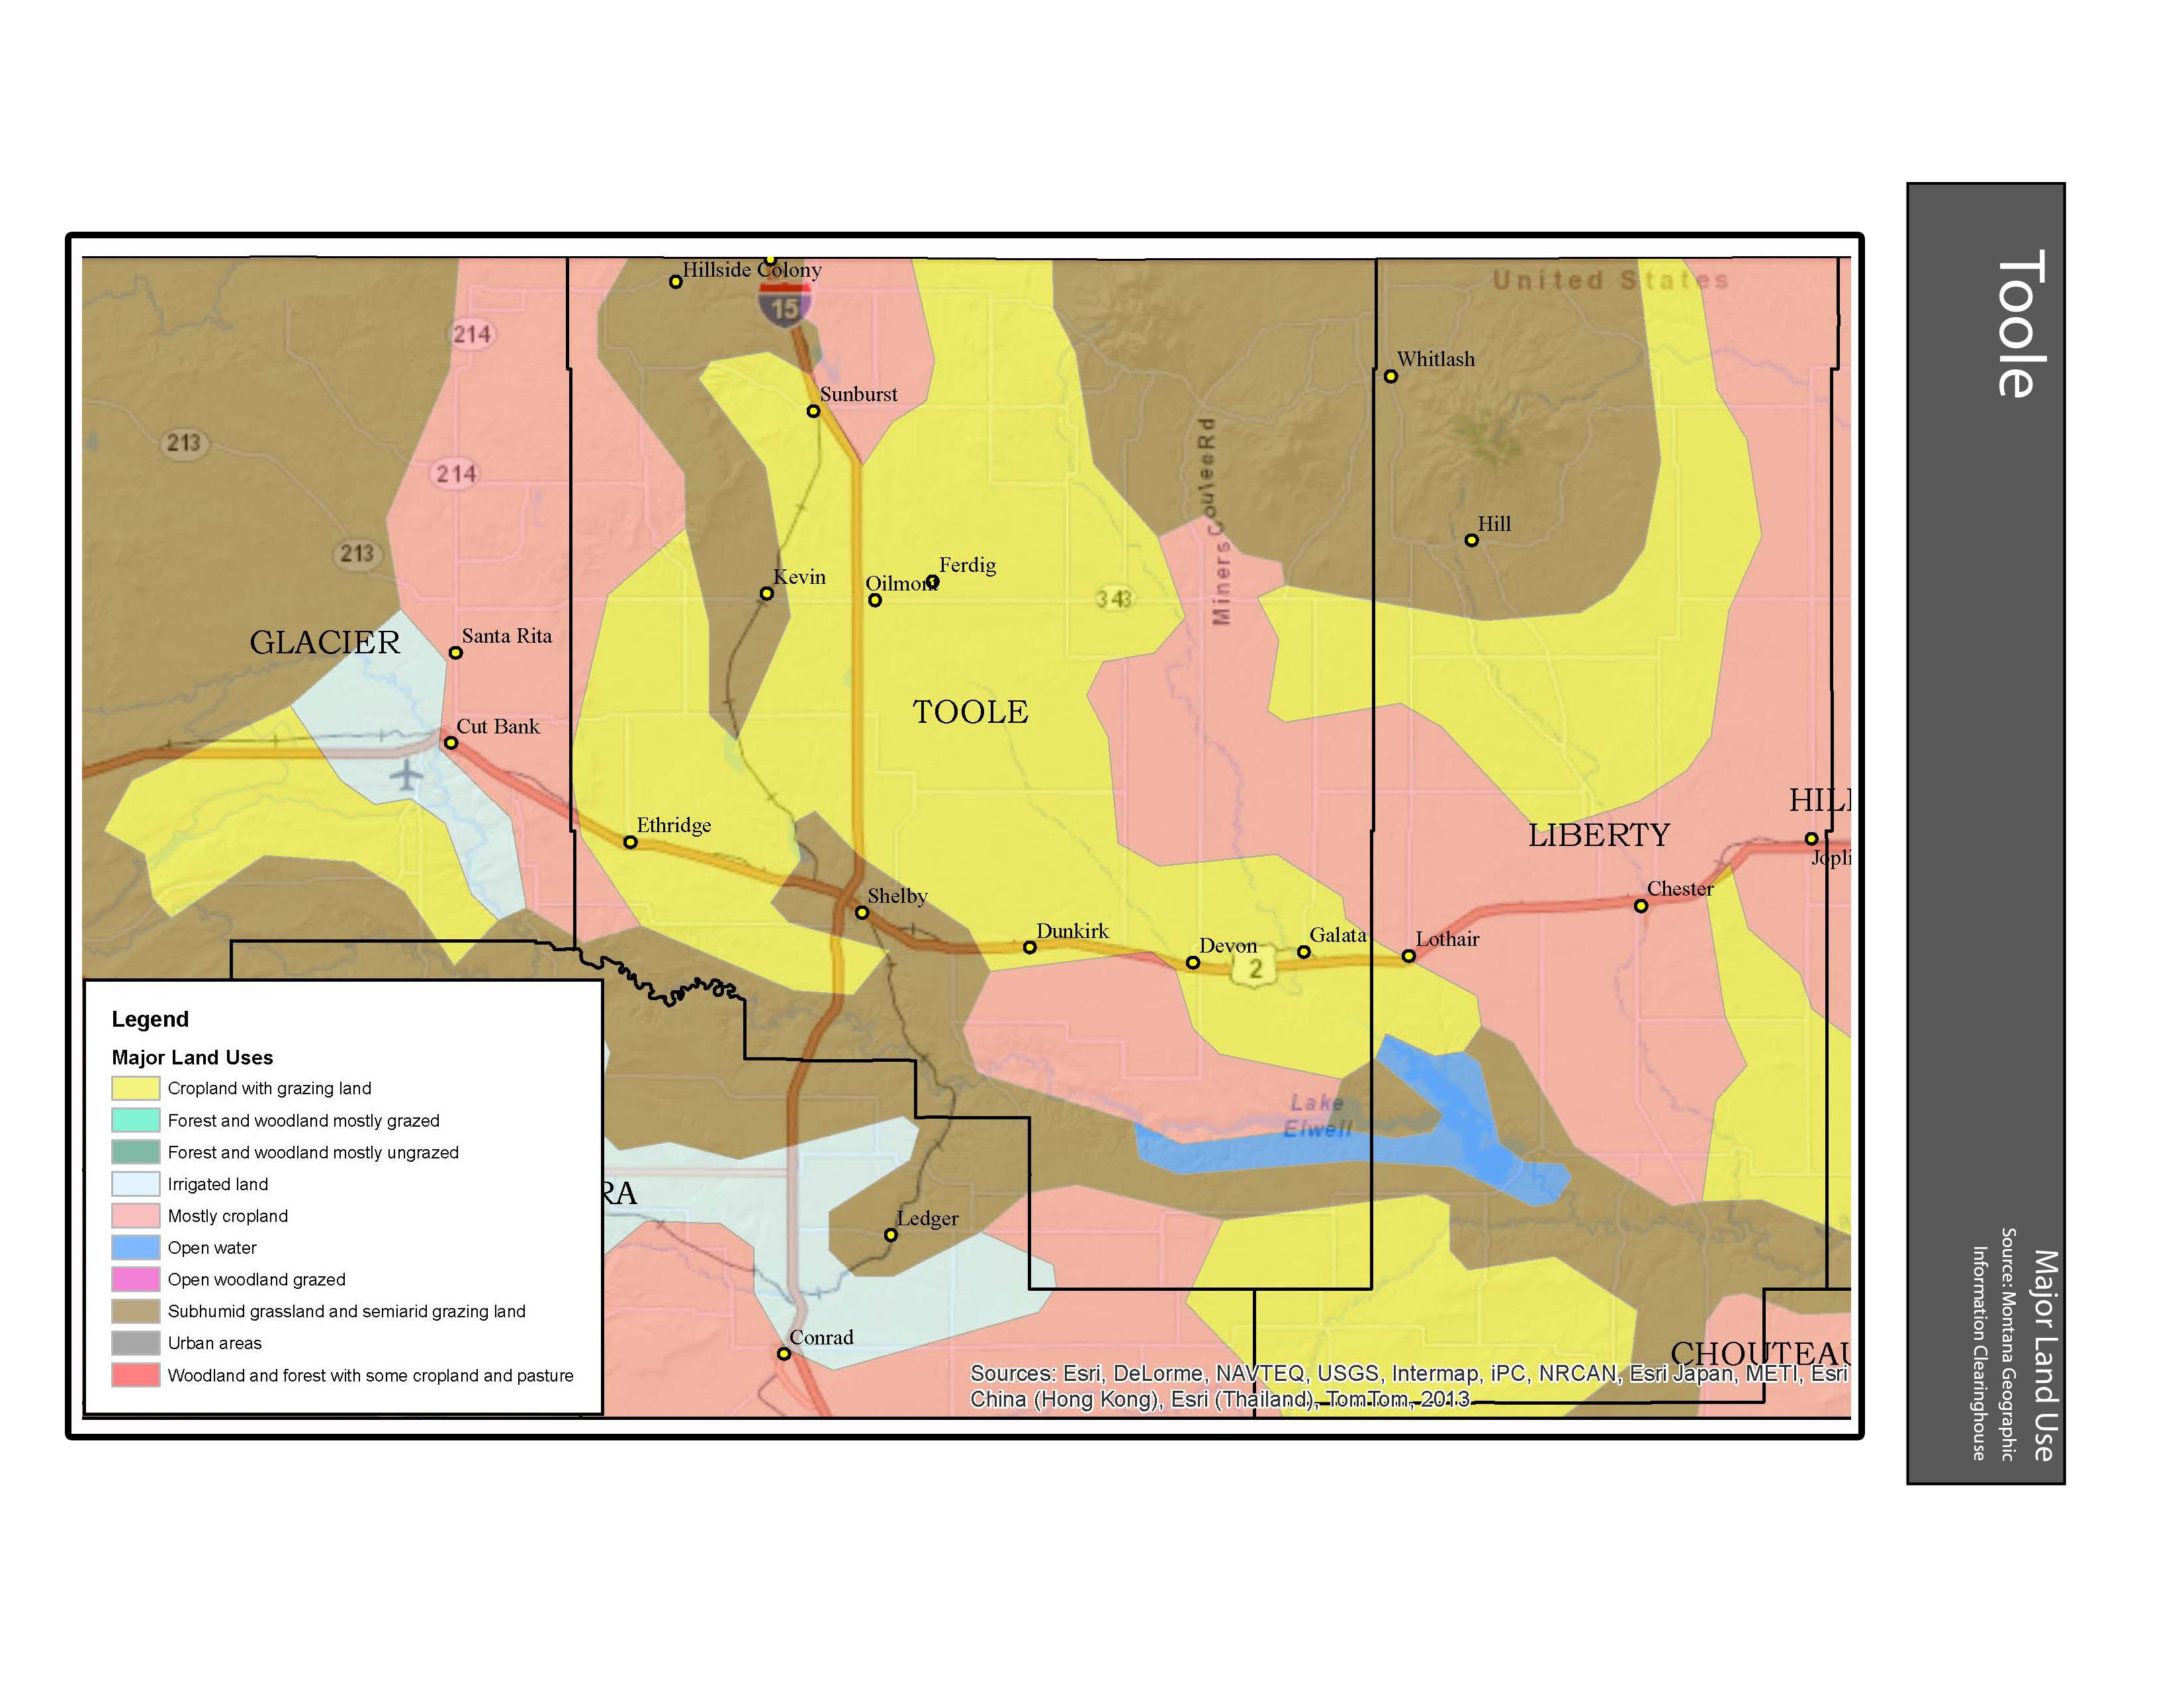 Major Land Use Toole County